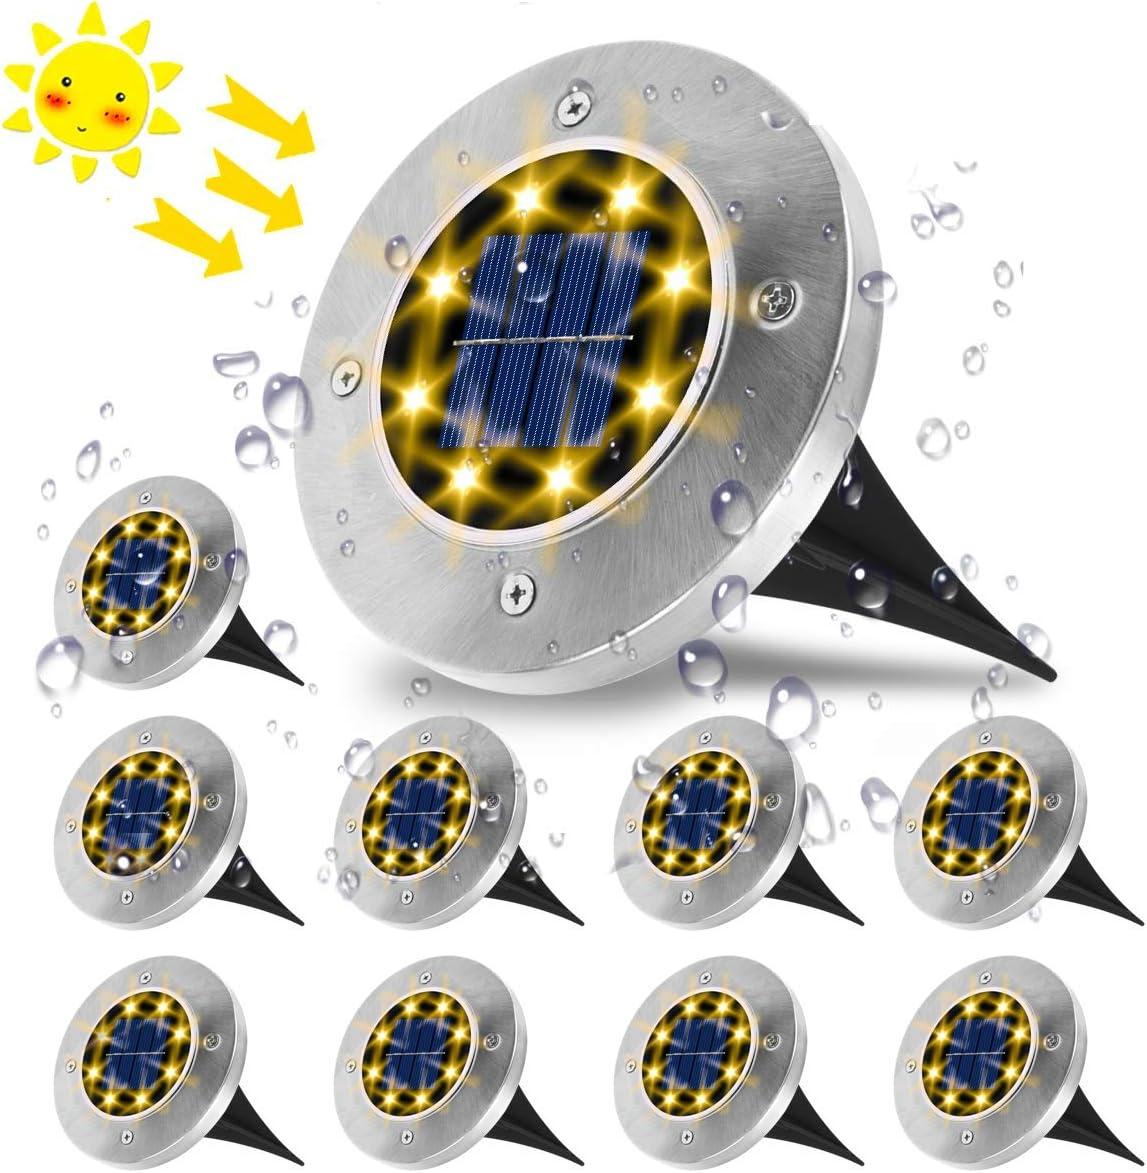 Luces Solares para Exterior, NKW Luz Focos led Exterior Solar Luz de Jardin IP65 impermeable Lámpara de exterior acero inoxidable para césped Camino Patio Jardín Lámpara -Blanco cálido